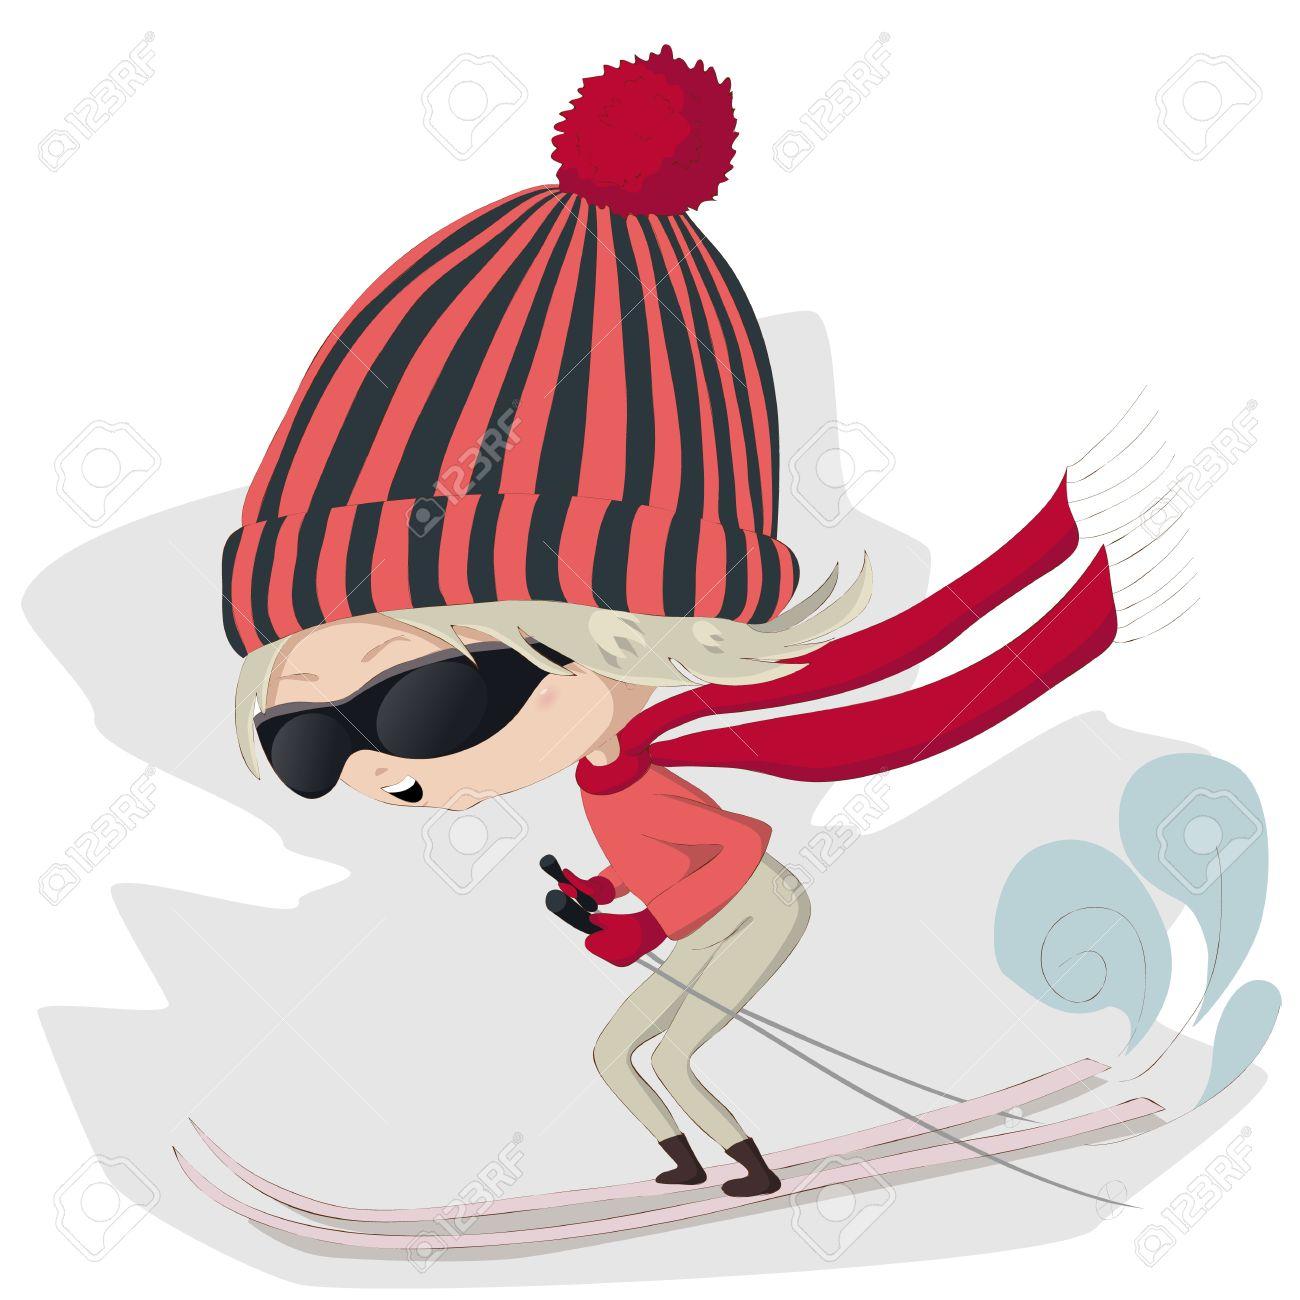 Vector Illustration Of A Cute Cartoon Skiing Girl Royalty Free.